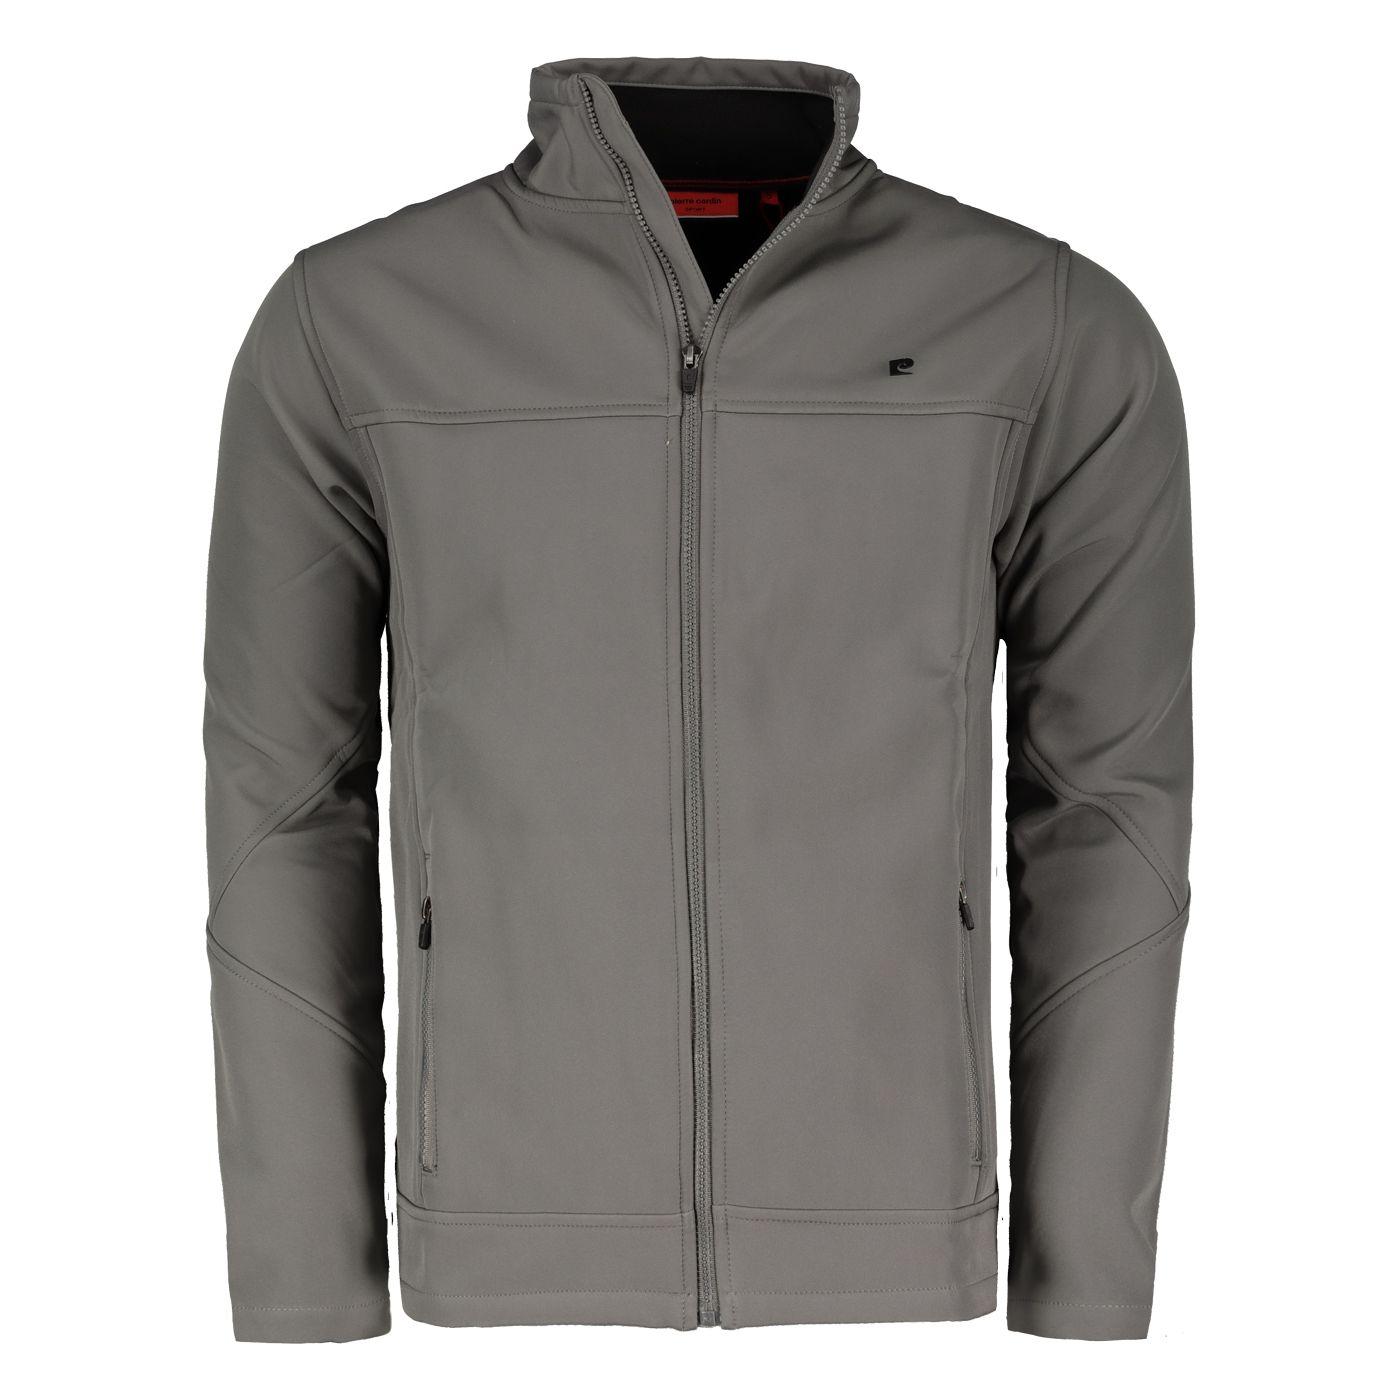 Pierre Cardin Soft Textured Jacket Mens